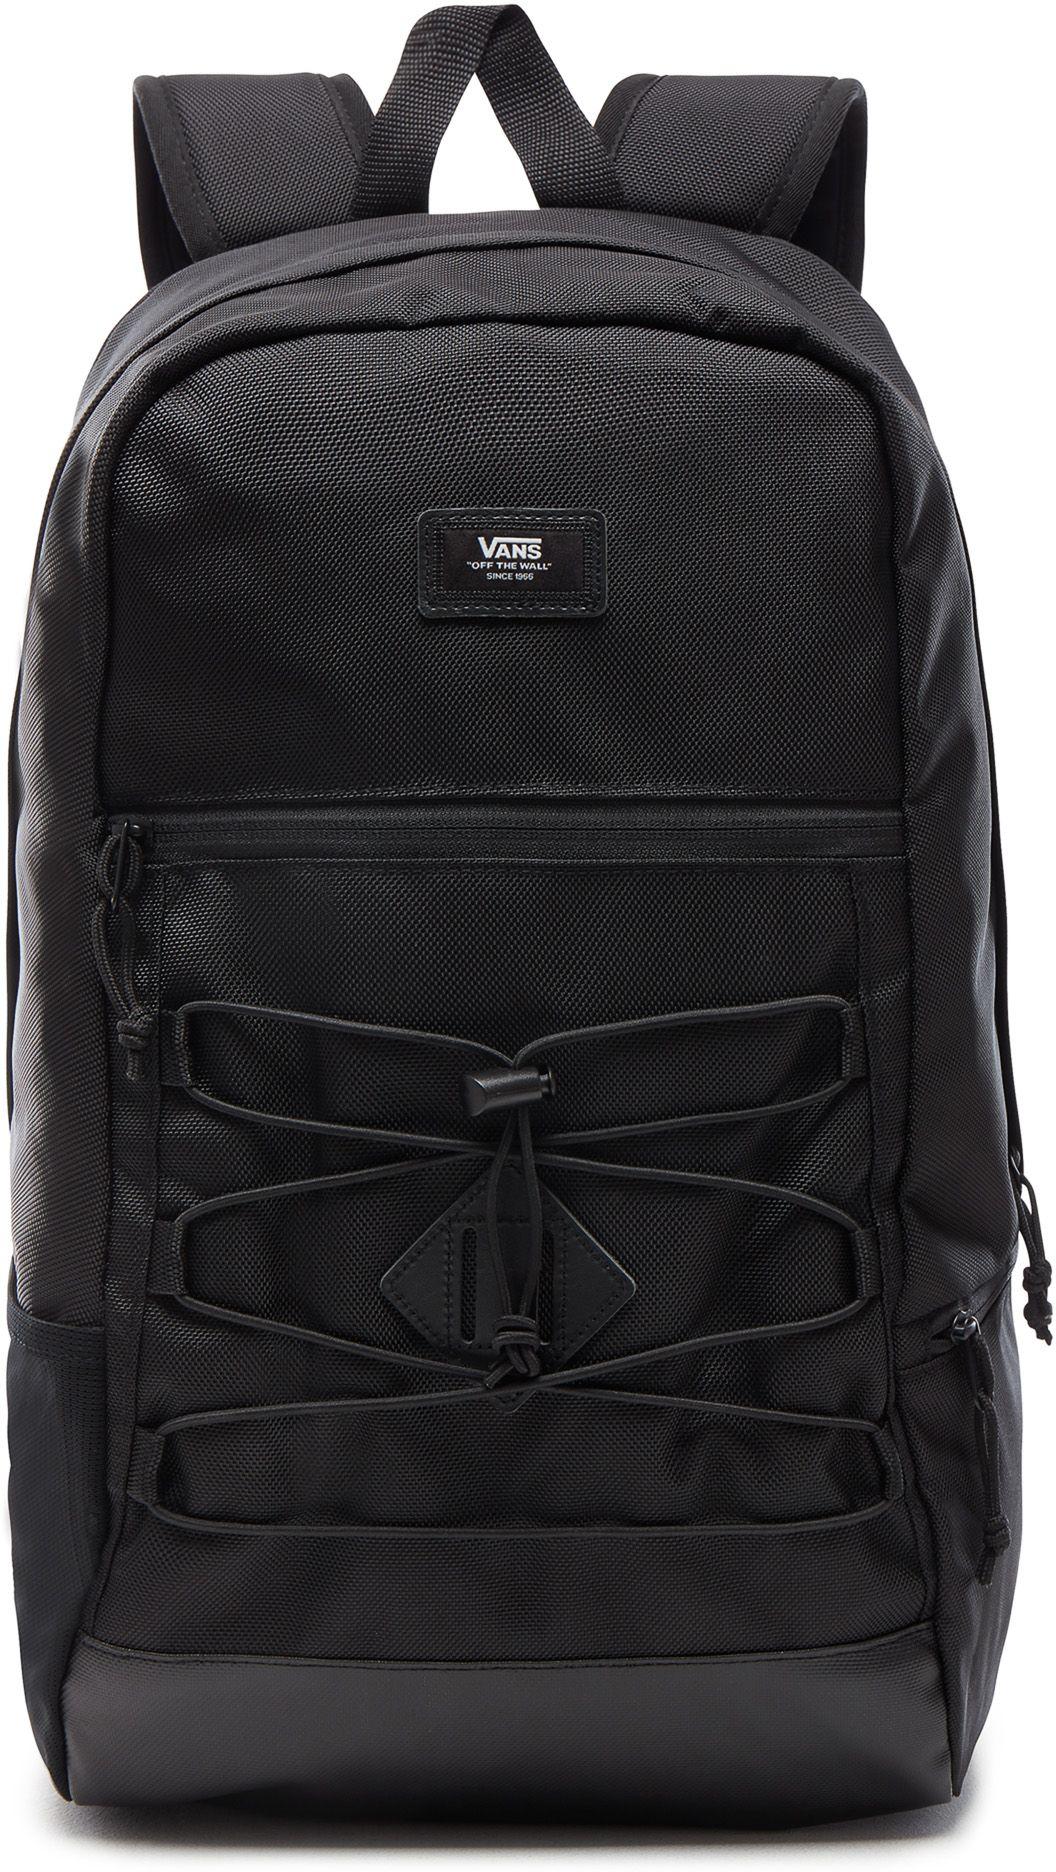 7fe856d5db batoh vans SNAG PLUS BACKPACK Black